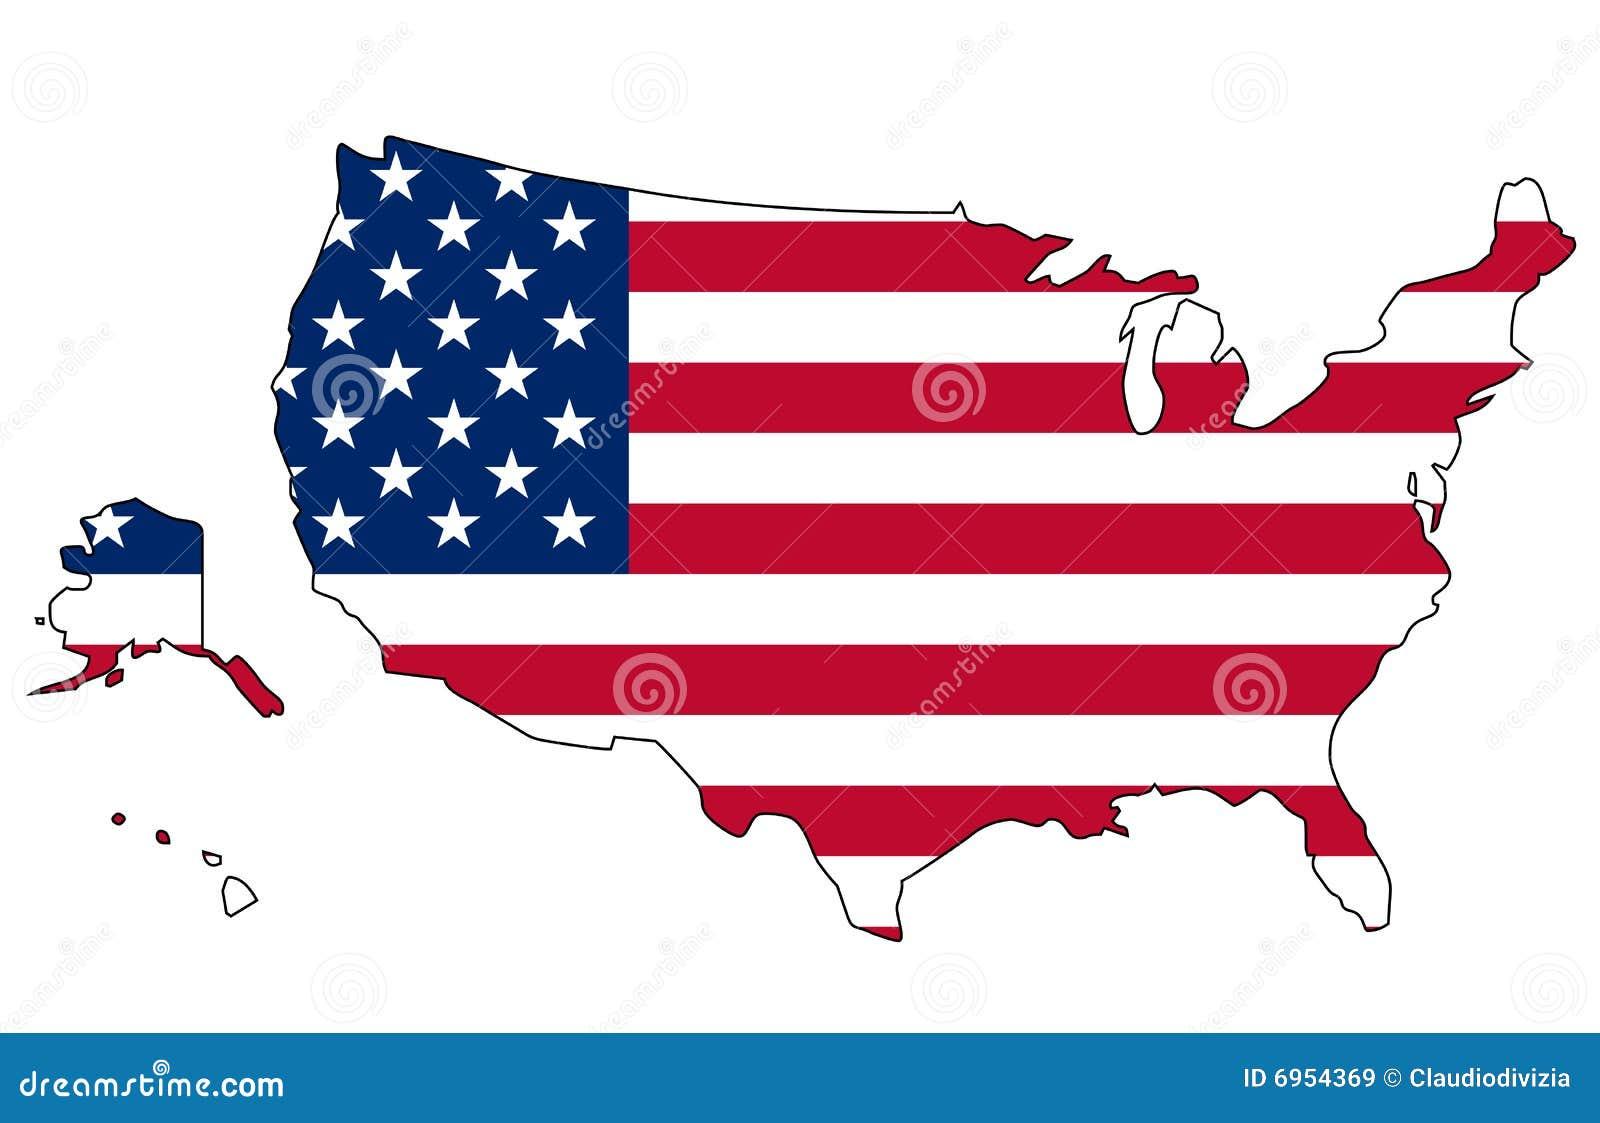 USA Flag And Map Royalty Free Stock Images Image - Map usa image